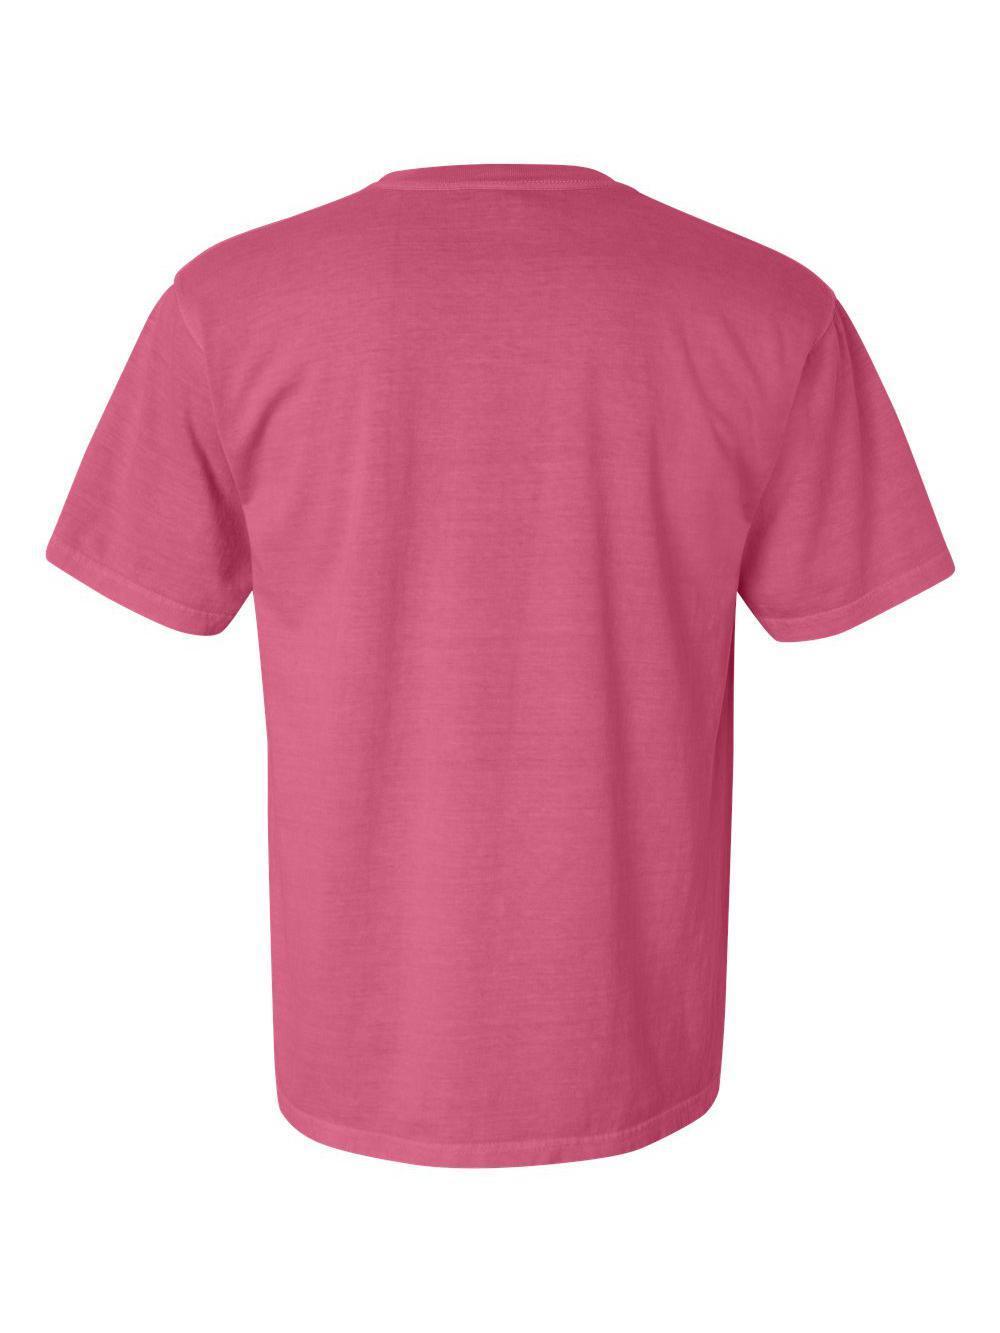 Comfort-Colors-Garment-Dyed-Heavyweight-Ringspun-Short-Sleeve-Shirt-1717 thumbnail 46